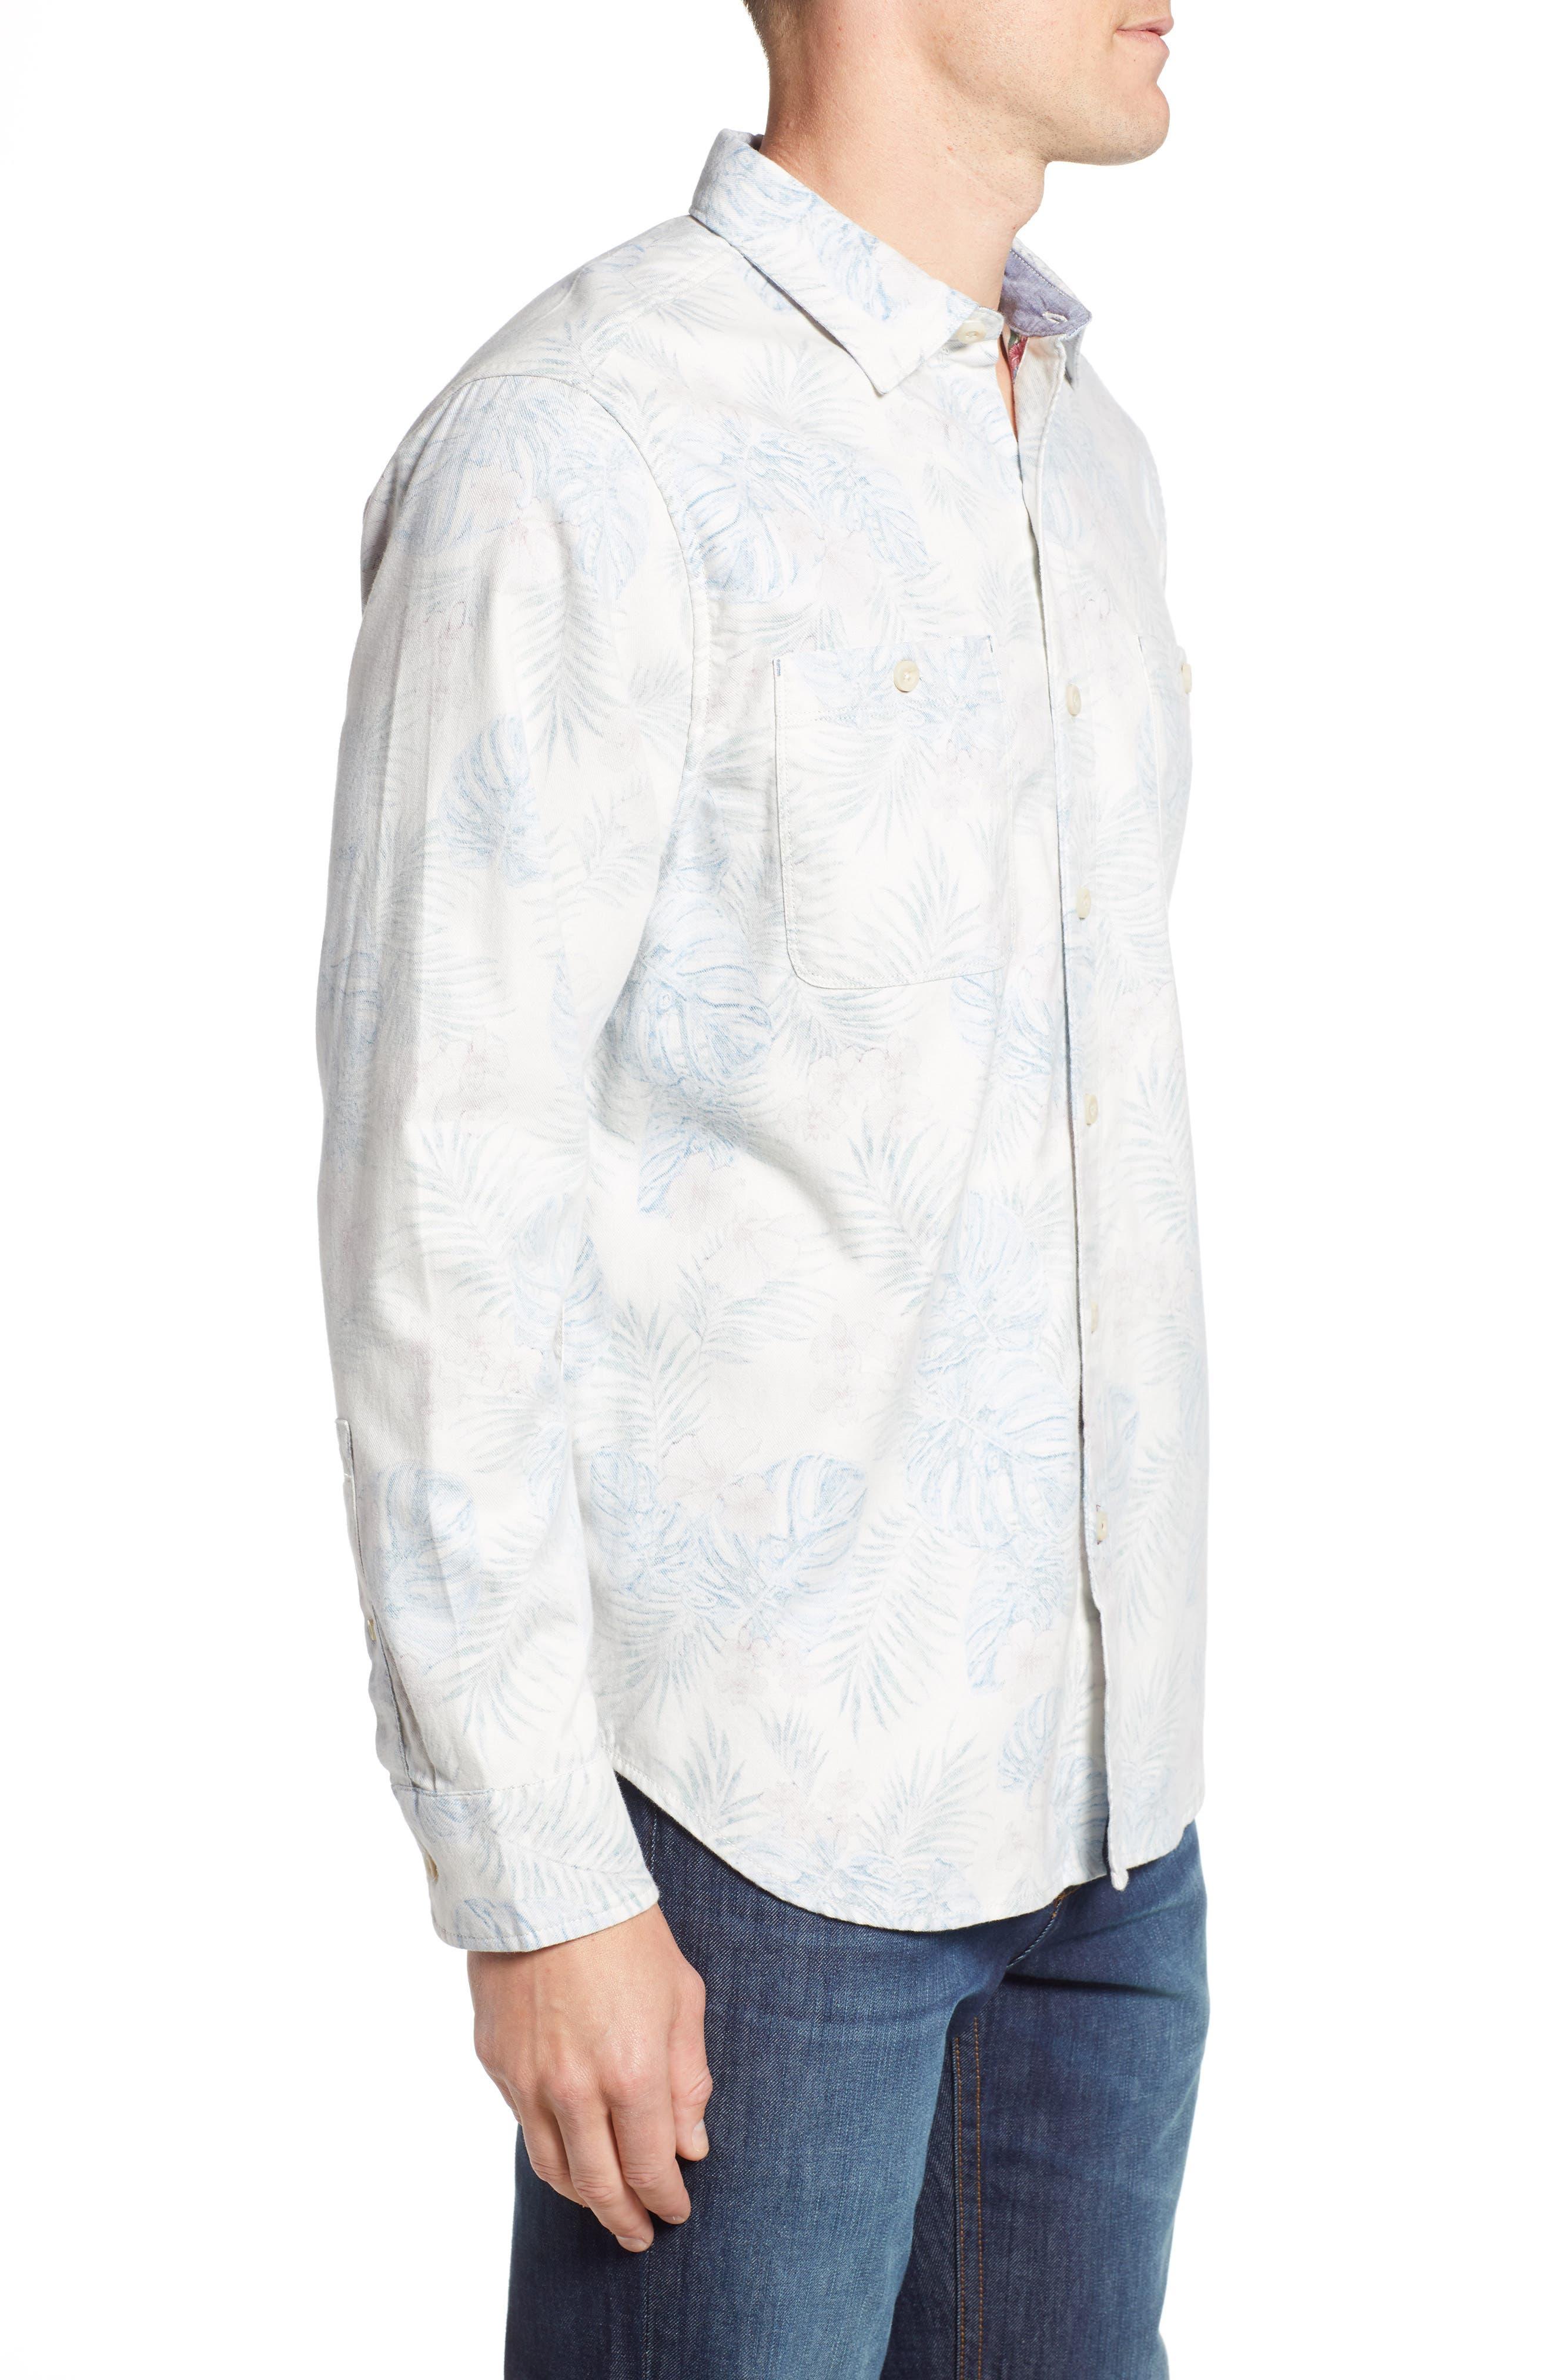 TOMMY BAHAMA, Beach Palms Long Sleeve Flannel Sport Shirt, Alternate thumbnail 3, color, 200